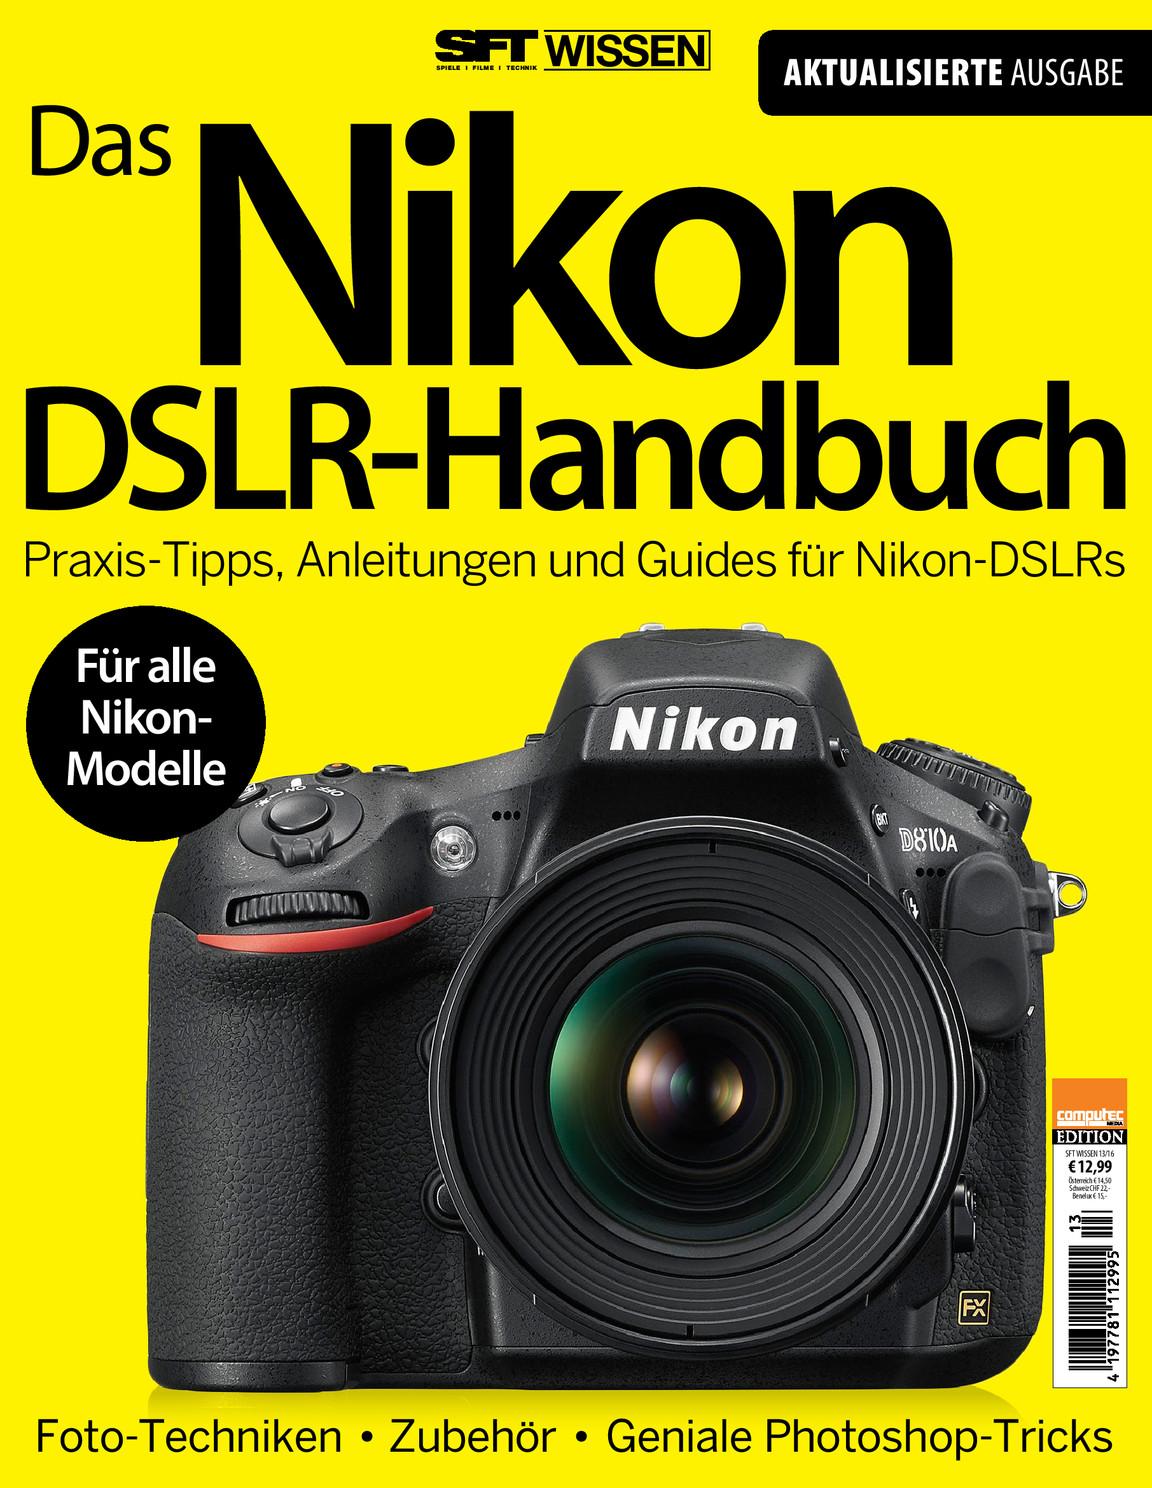 Das Nikon Dslr Handbuch Nr 5 Sft